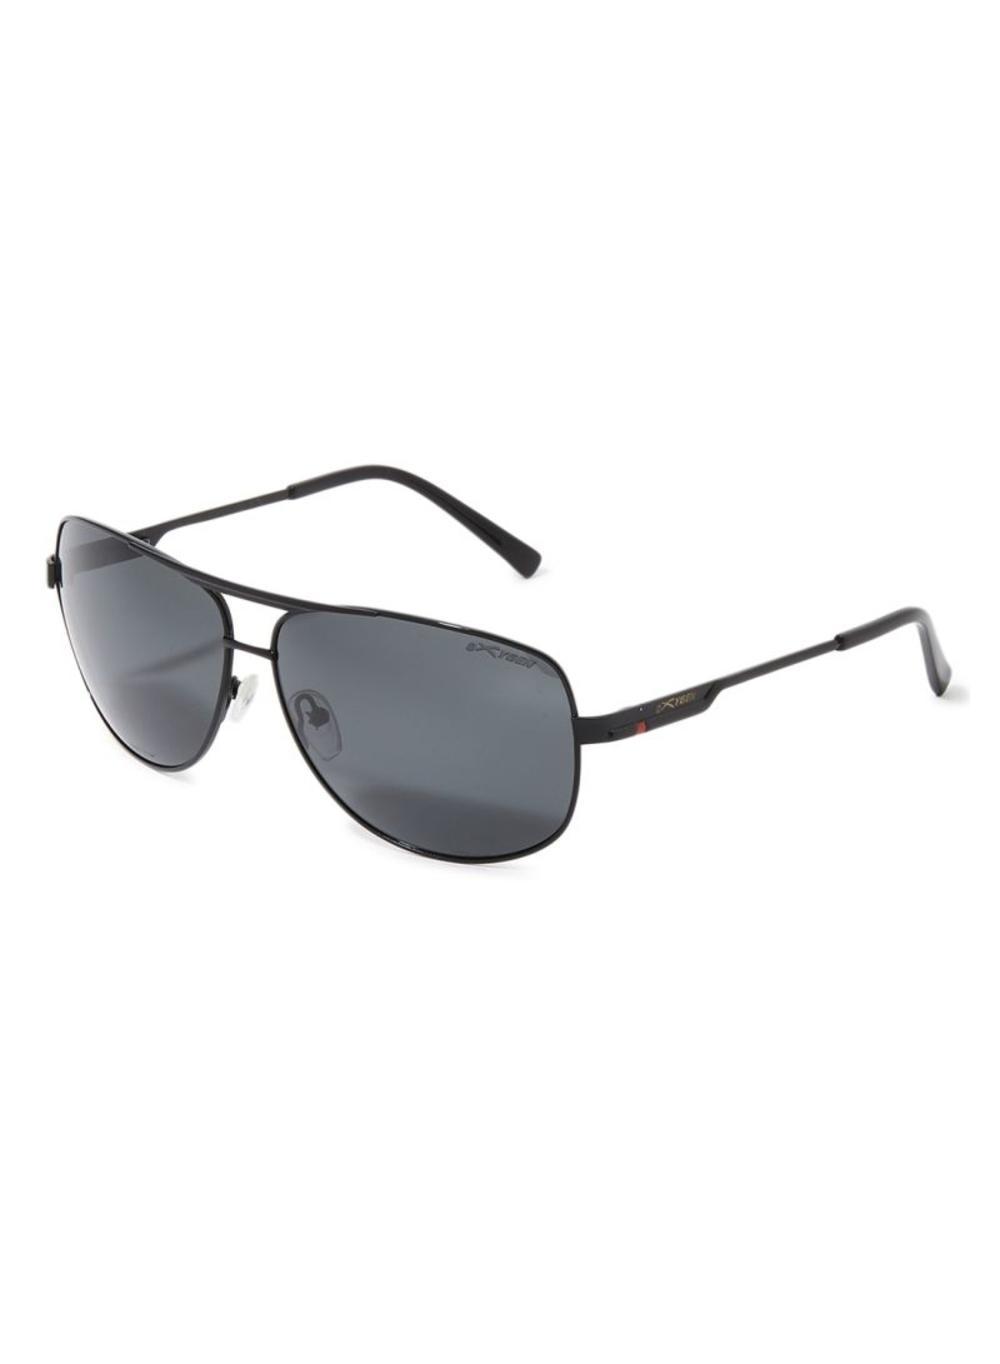 OXYGEN Mens Pilot Shape UV Protection Sunglasses OX9007-C2